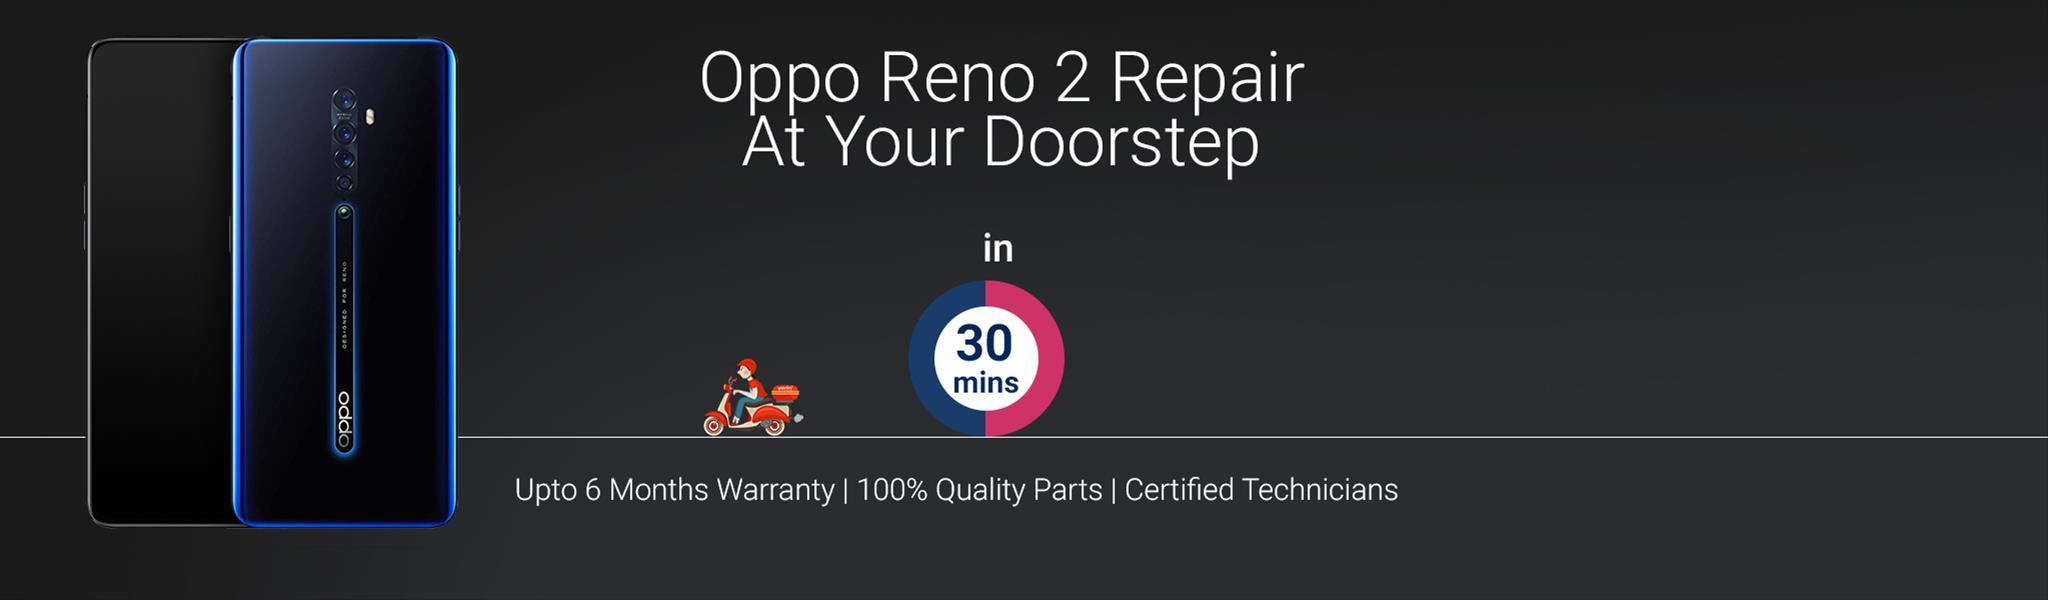 oppo-reno-2-repair.jpg